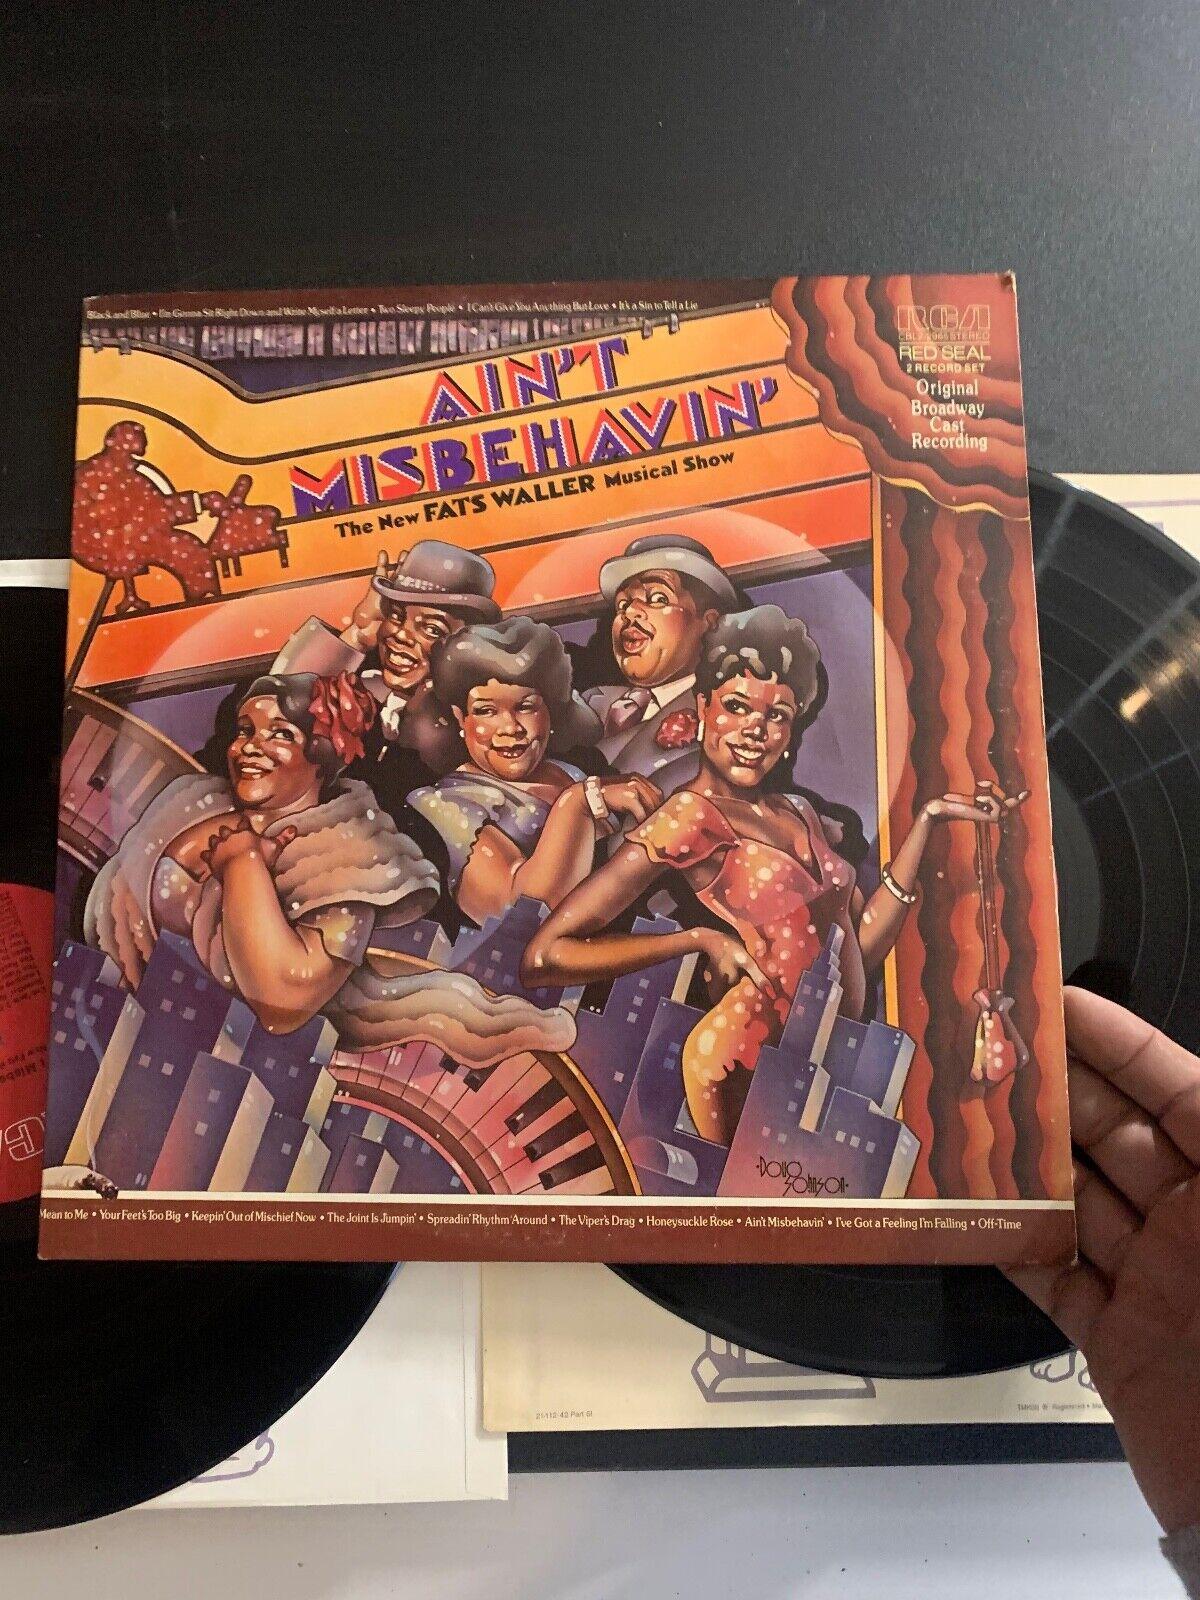 LP RECORD AIN T MISBEHAVIN FATS WALLER MUSICAL RCA 2 RECORD SET ORIGINAL CAST - $9.99